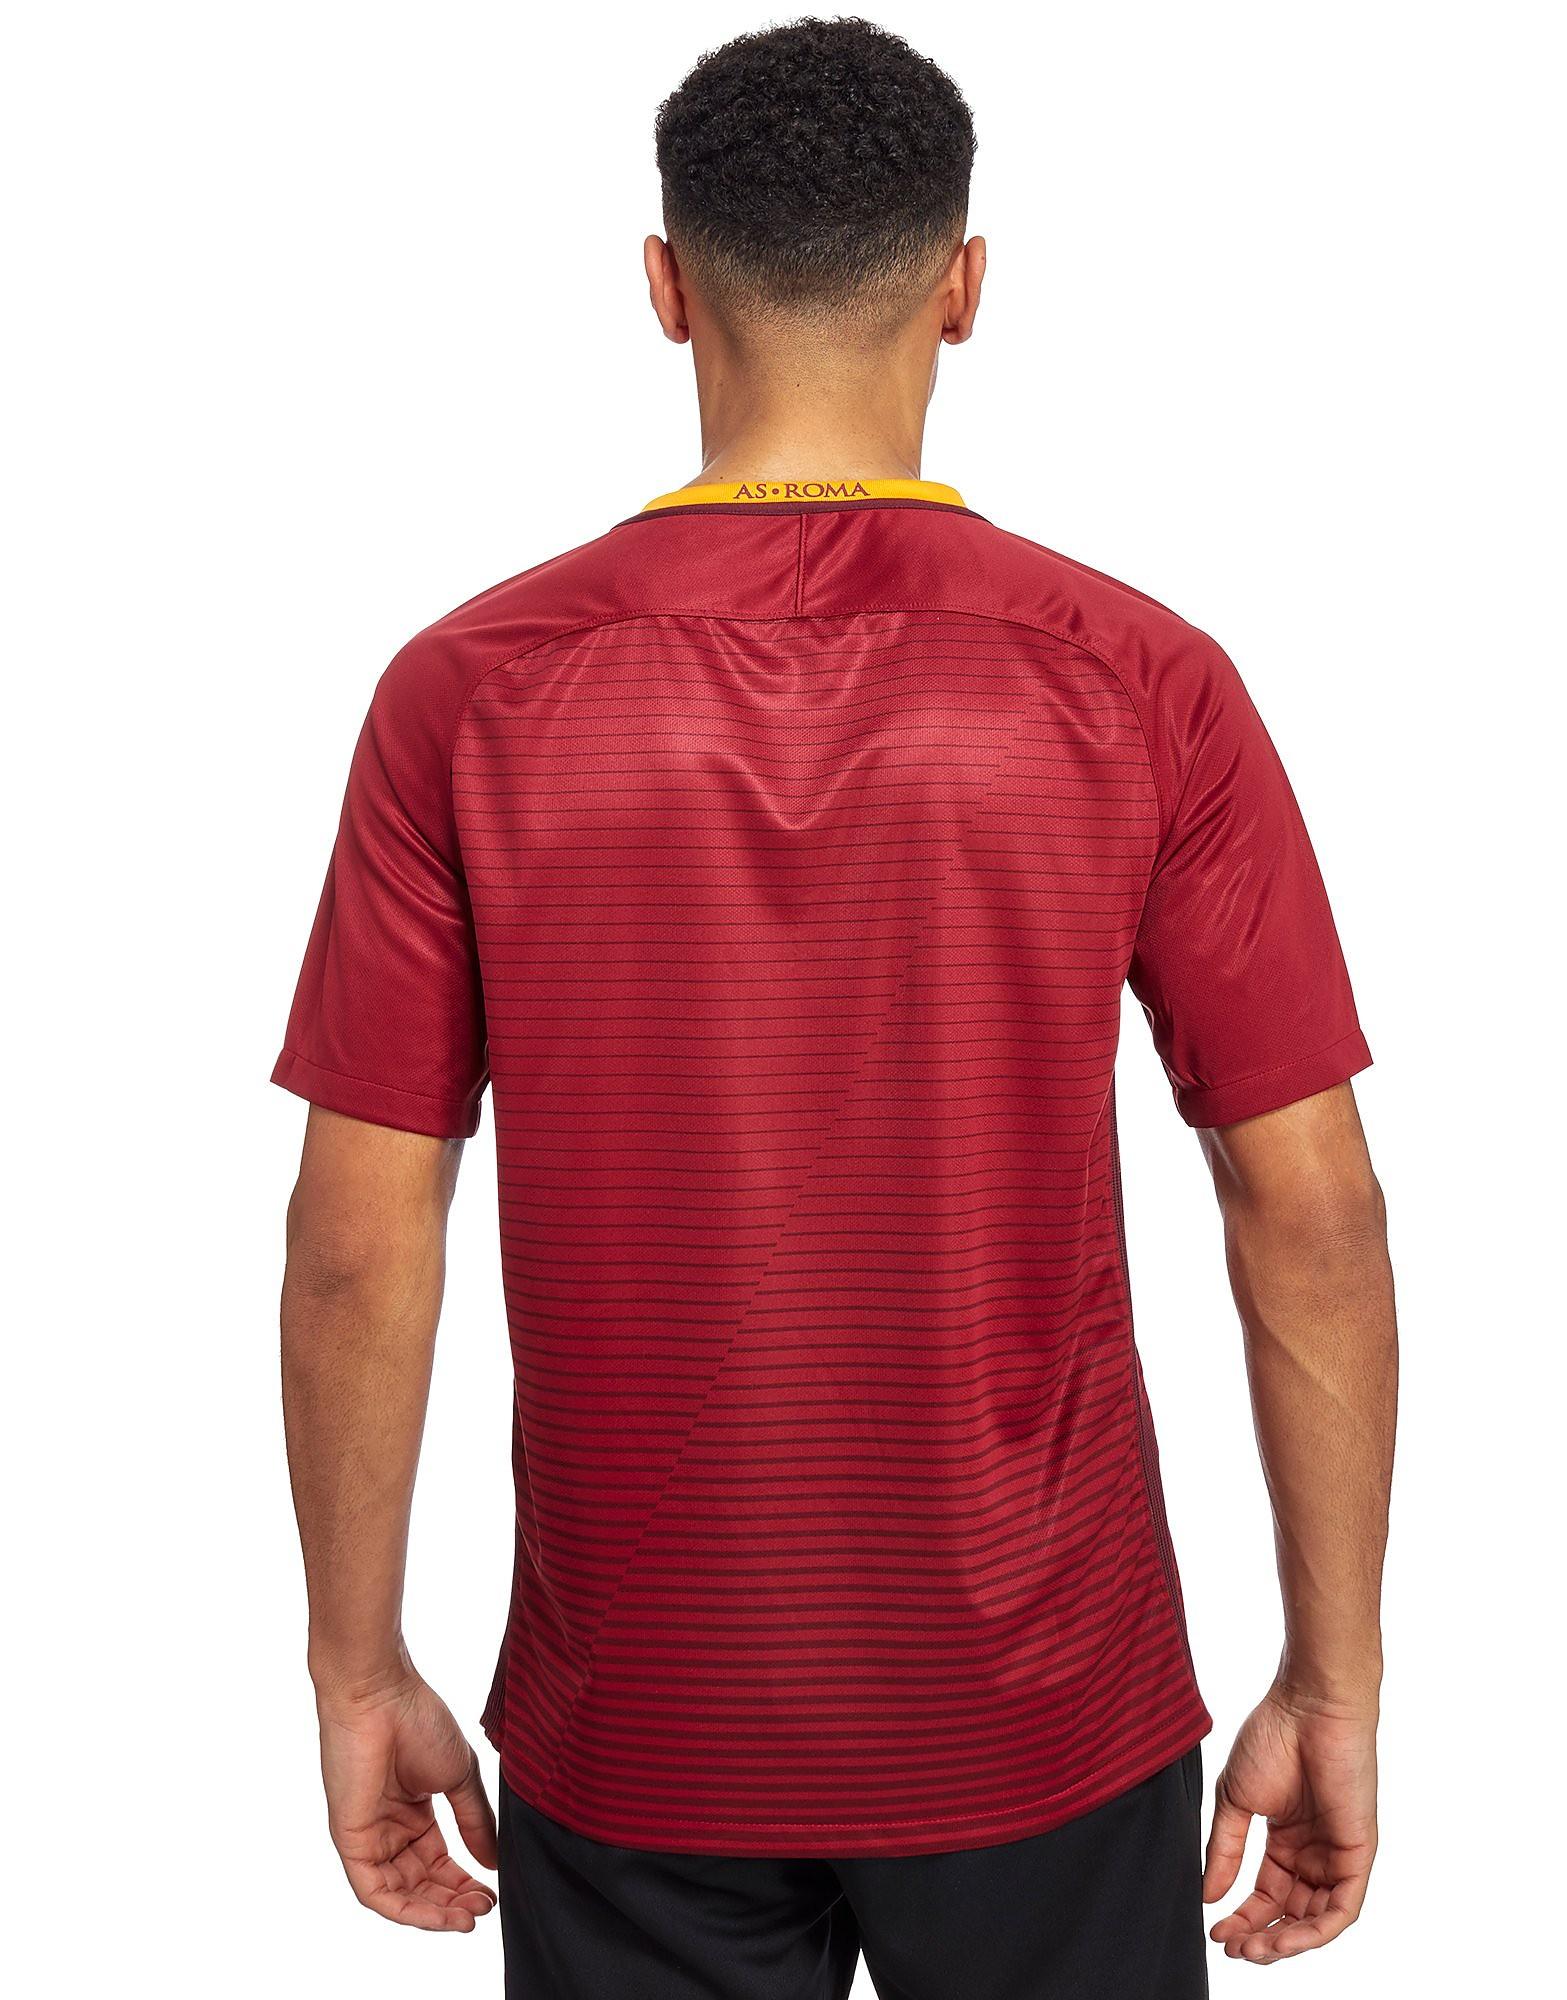 Nike Roma 2016/17 hjemmebanetrøje